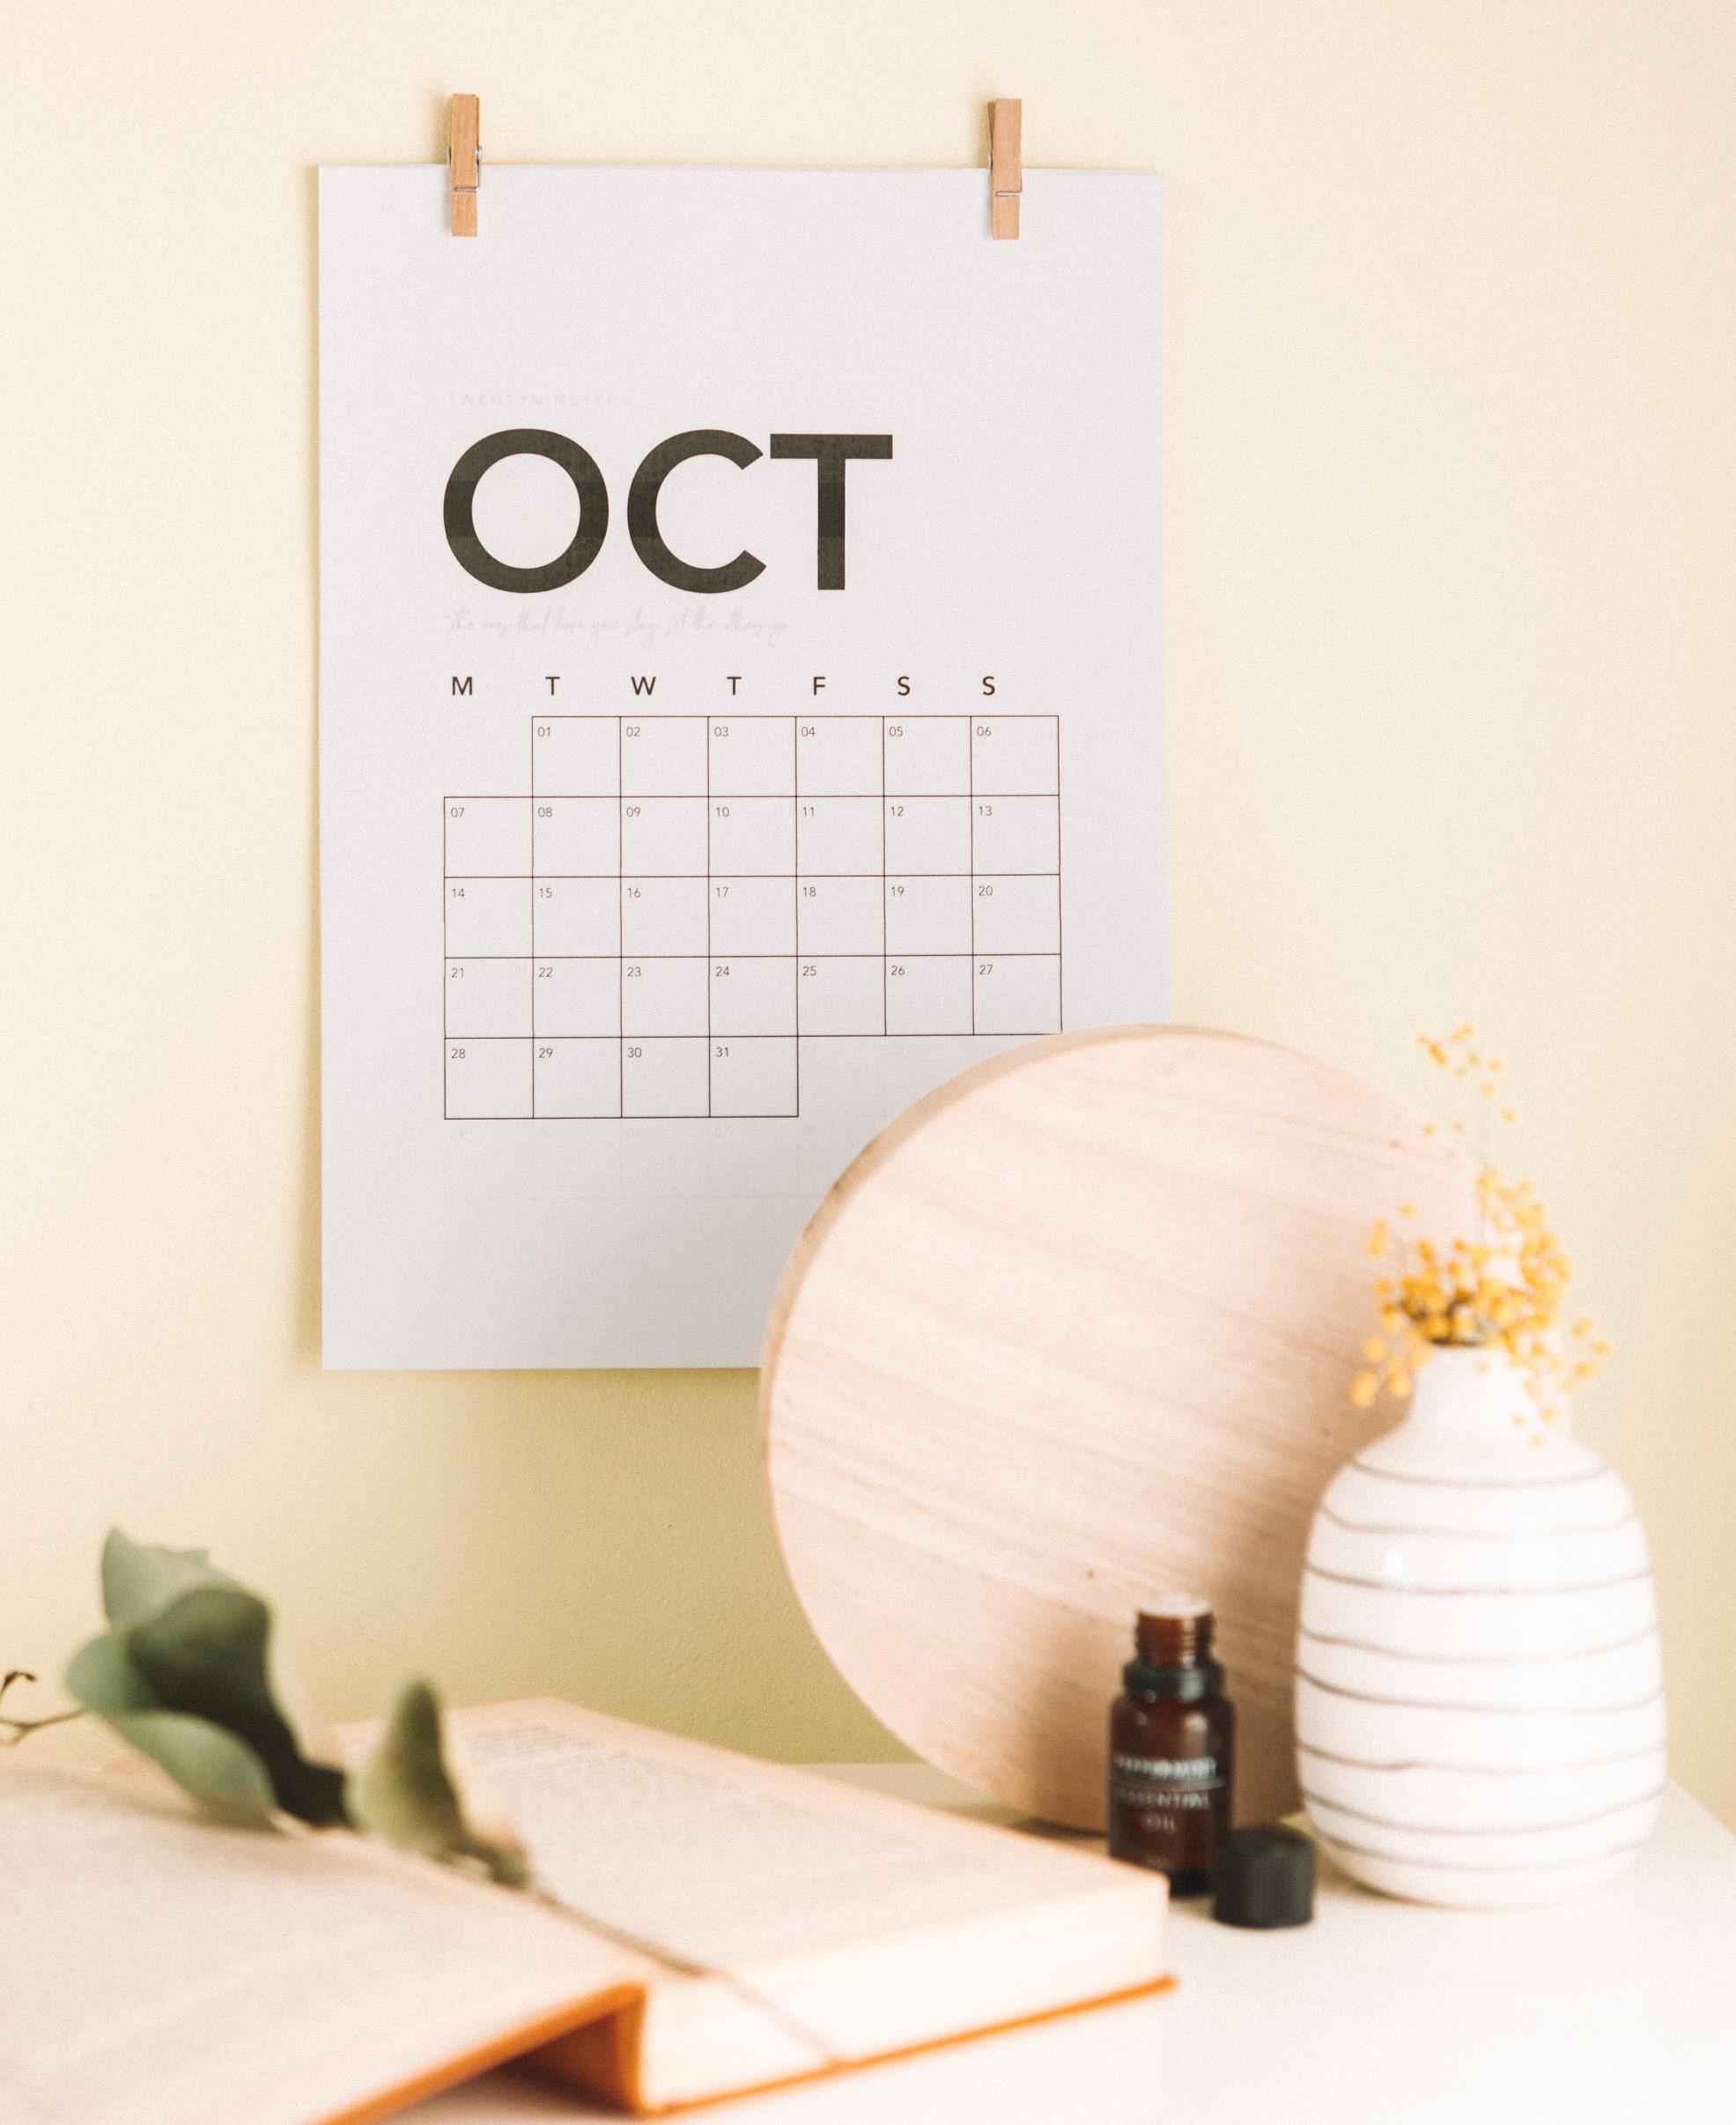 Activiteitenprogramma oktober 2020